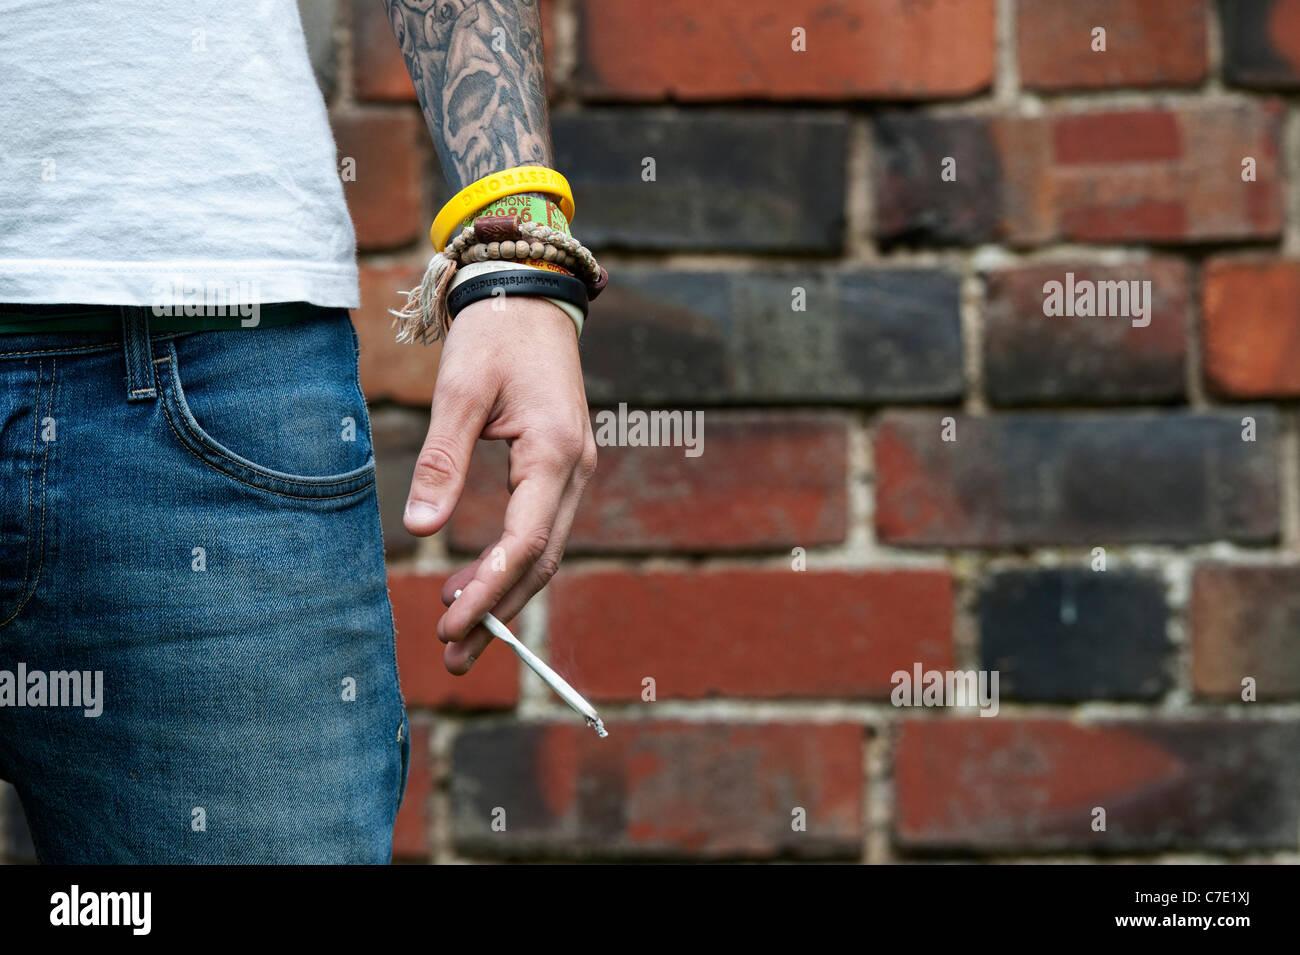 Tatuadas adolescente sosteniendo un porro de marihuana Foto de stock